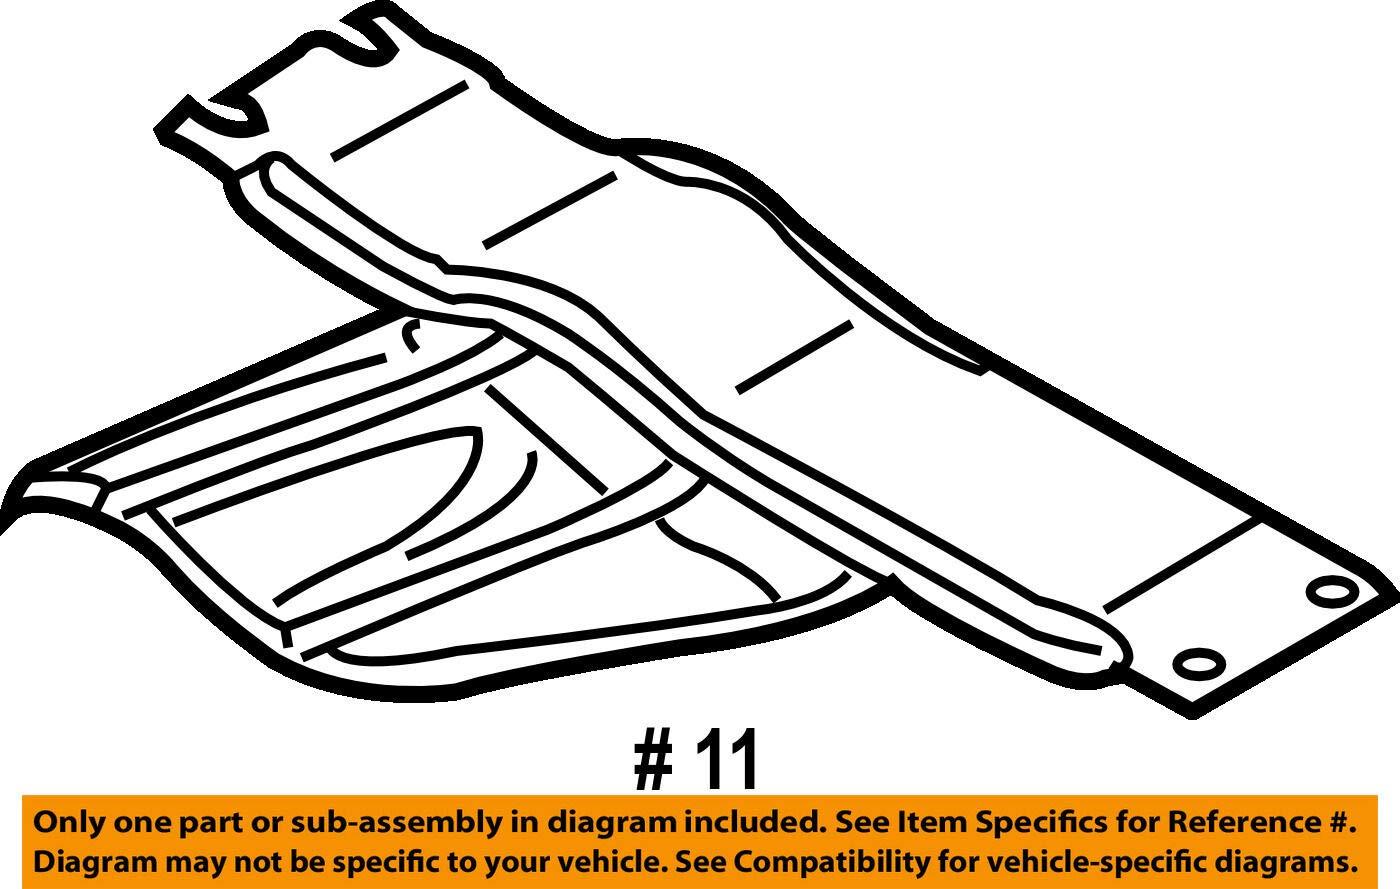 Mazda OEM 07-12 CX-7 Floor Rails-Bulkhead EH145639XA by Mazda (Image #2)